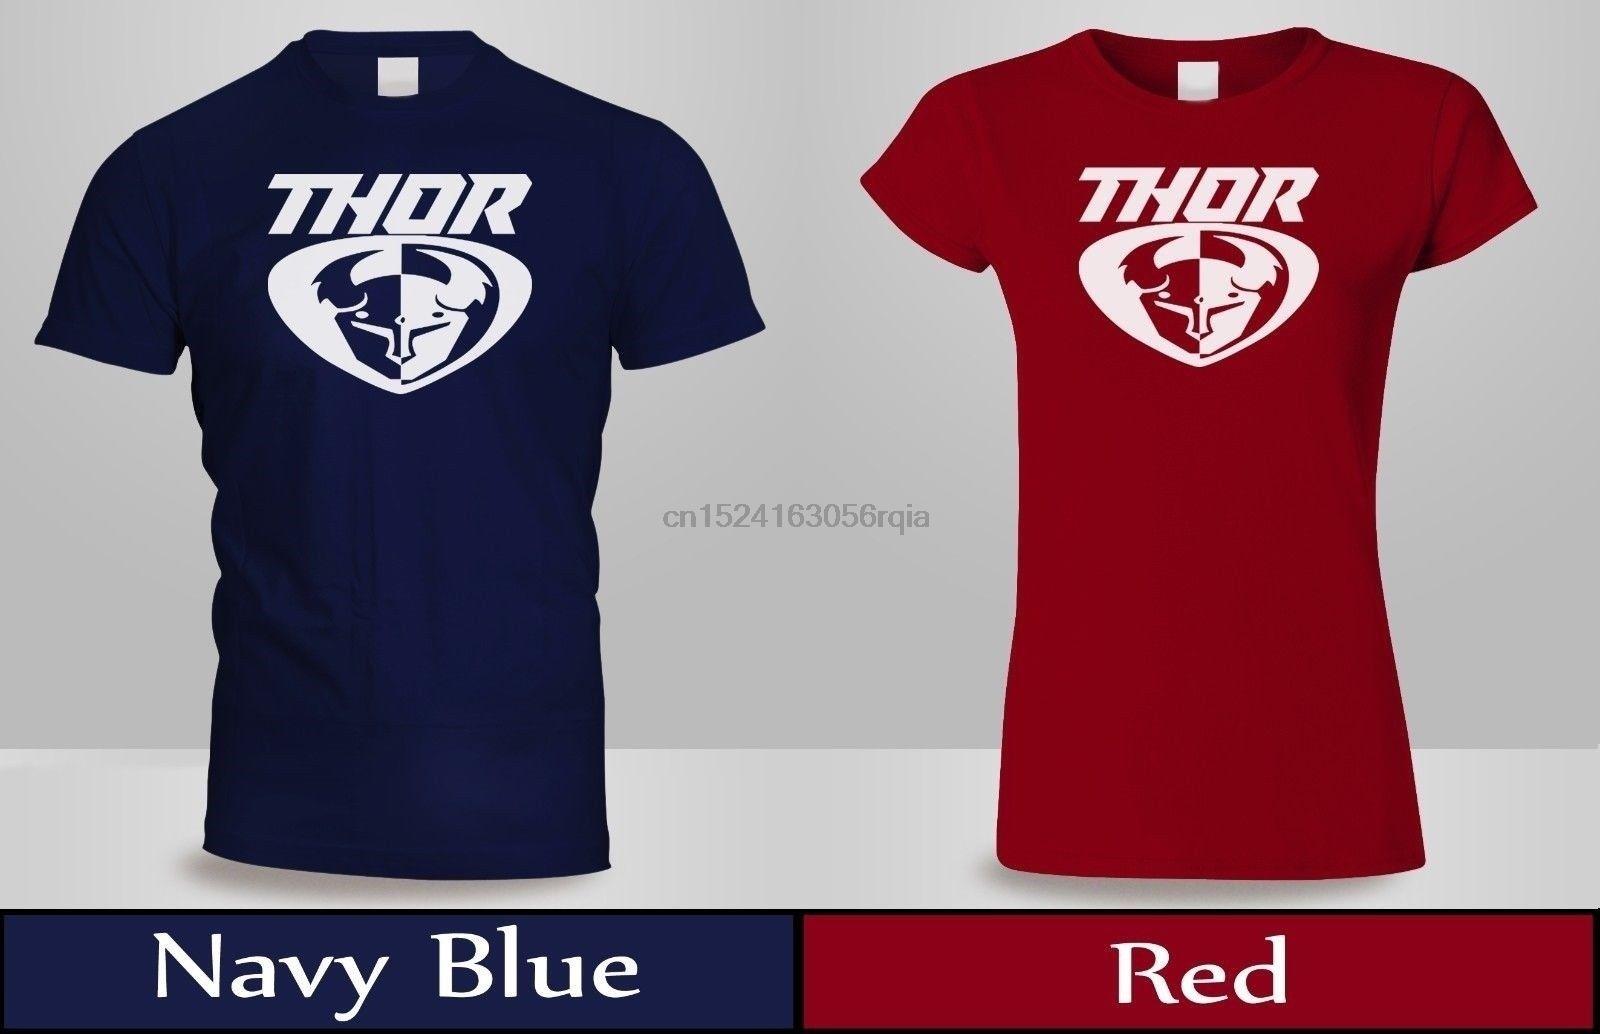 Thor MX Loud Motokros Off Road Dirt Bike Tişört MensWomens Kırmızı Lacivert Tee